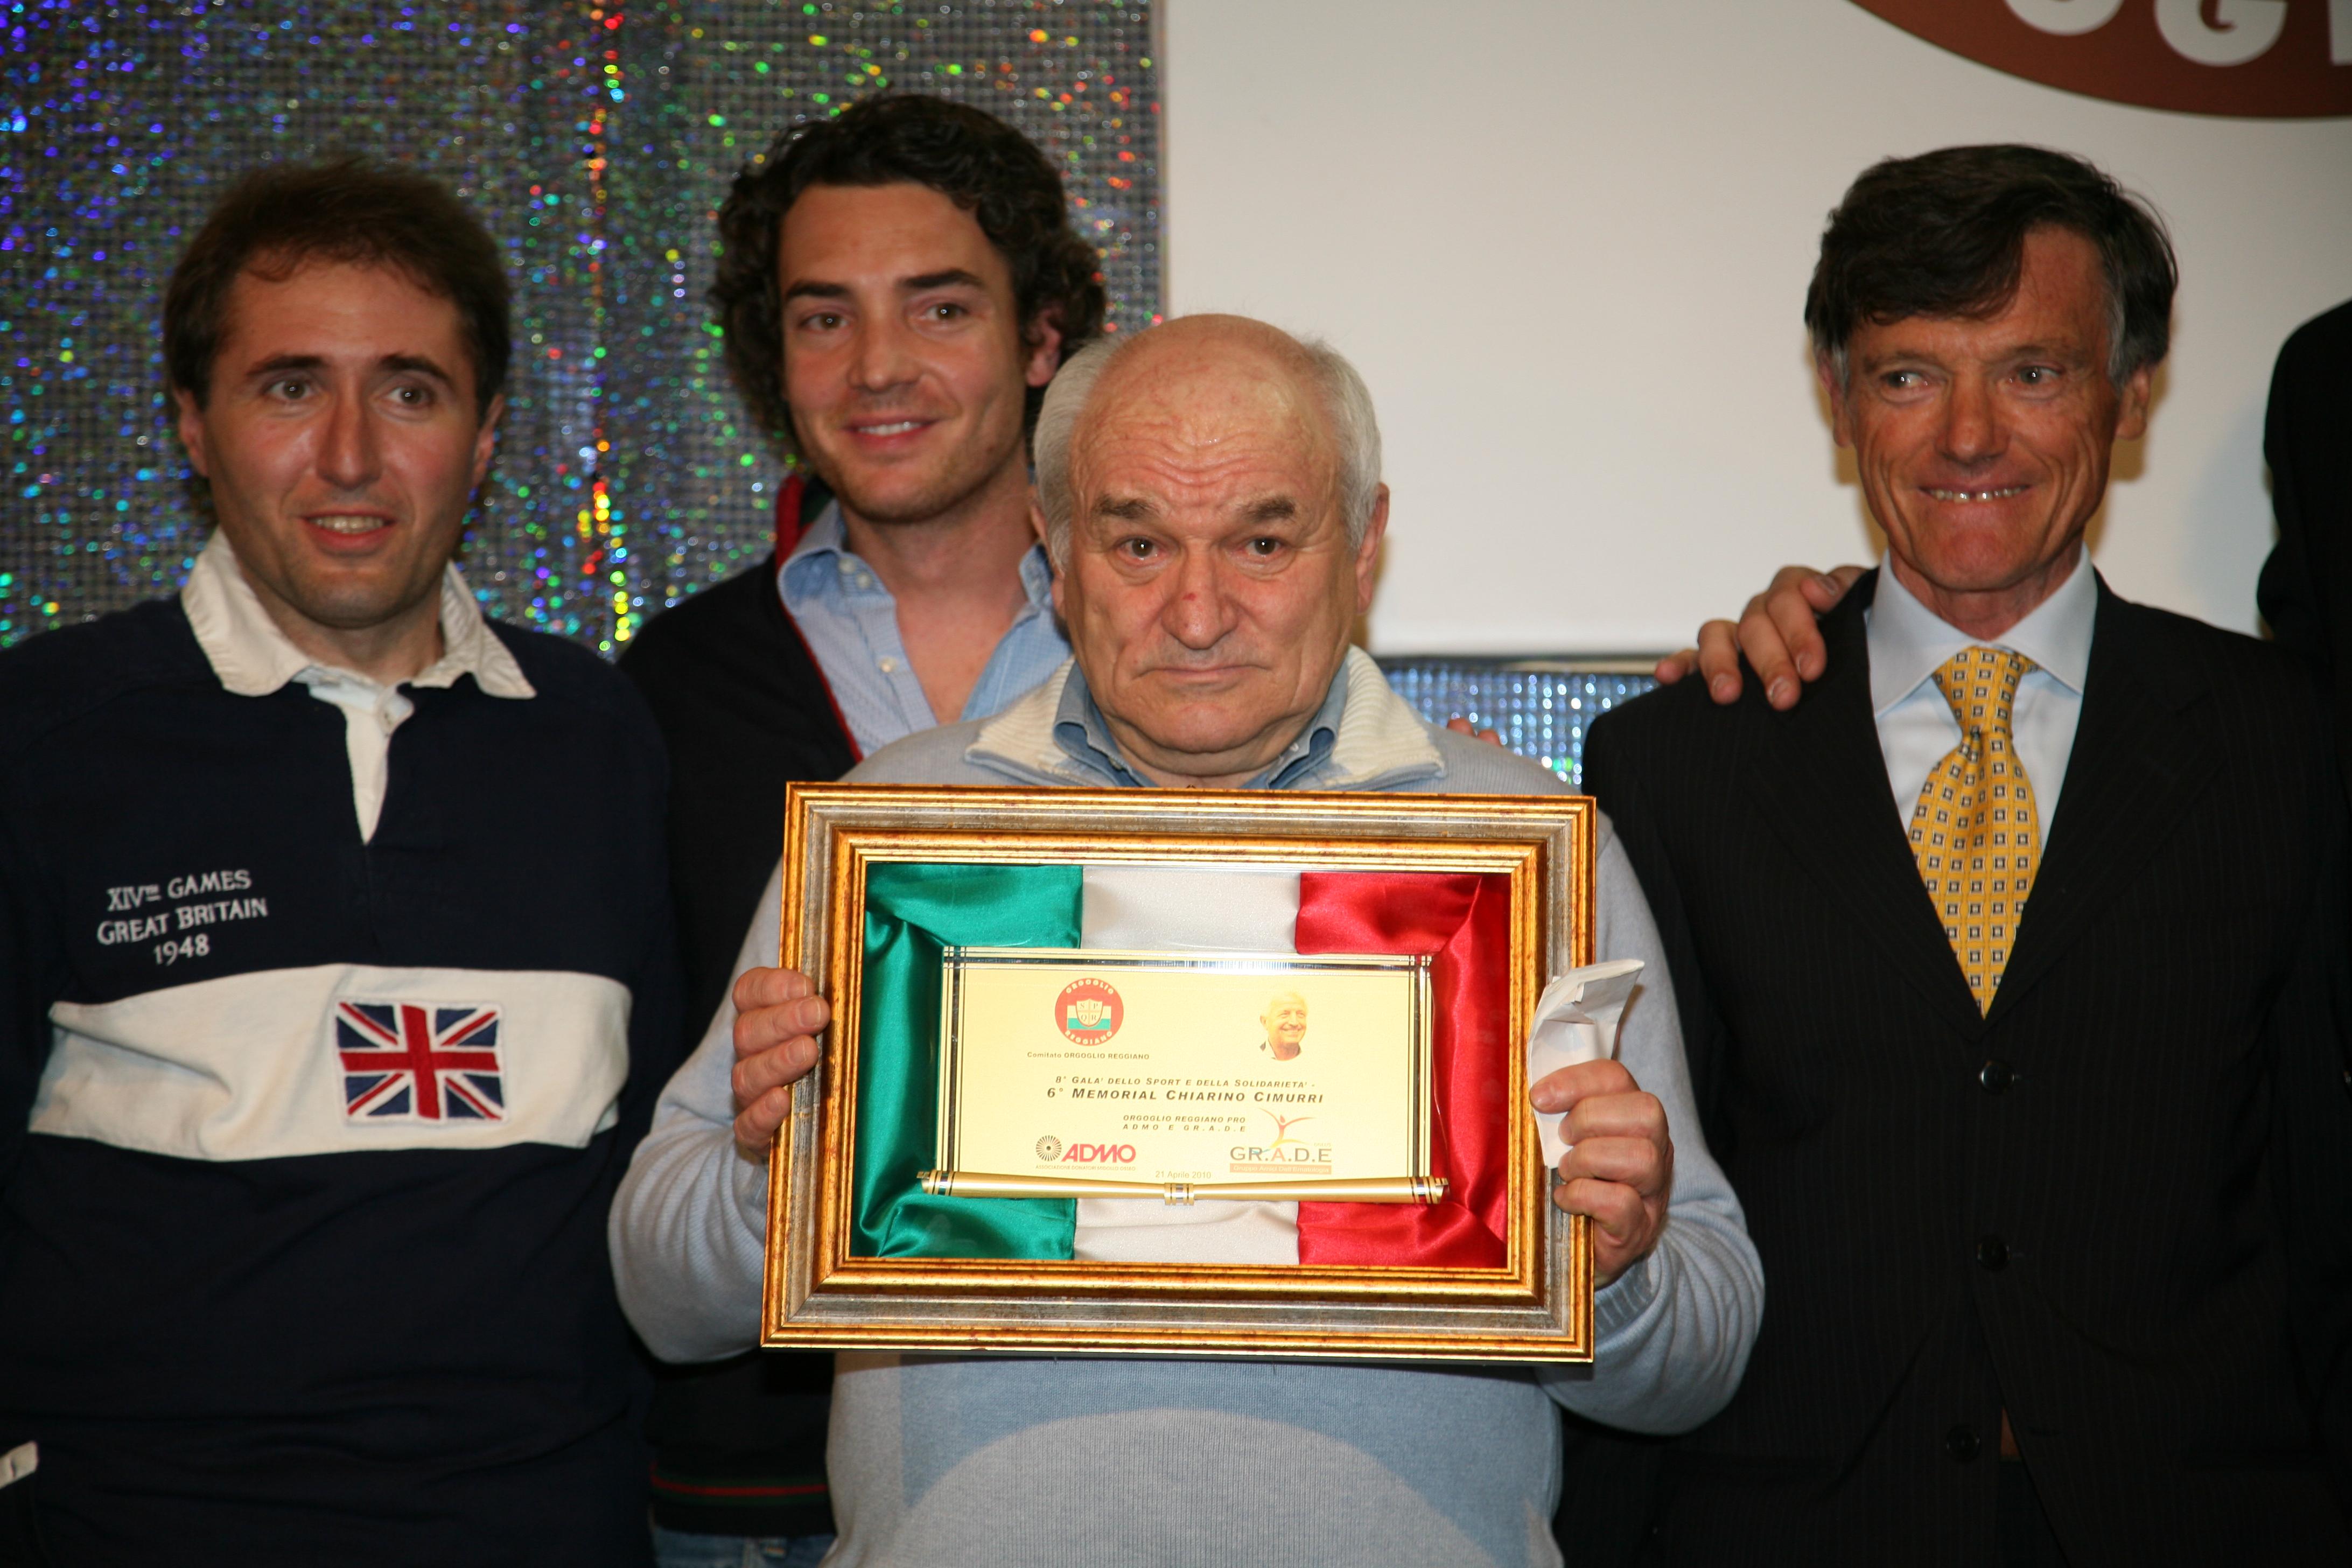 Gala consegna memorial Cimurri a Simonazzi